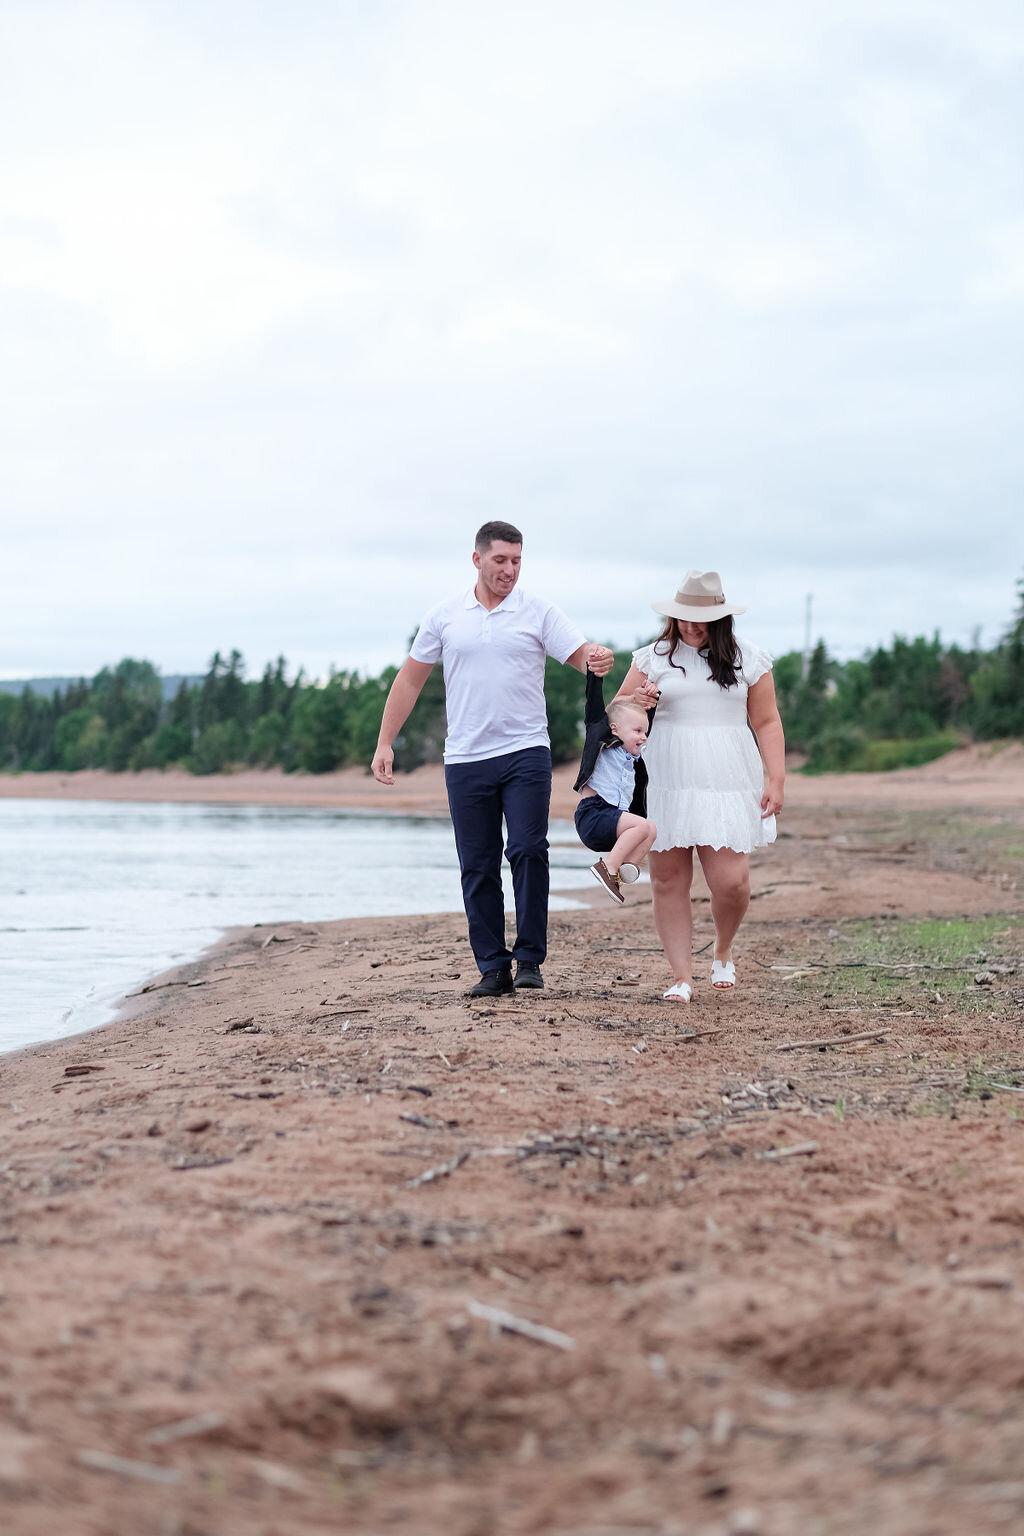 August 2019 - Newfoundland